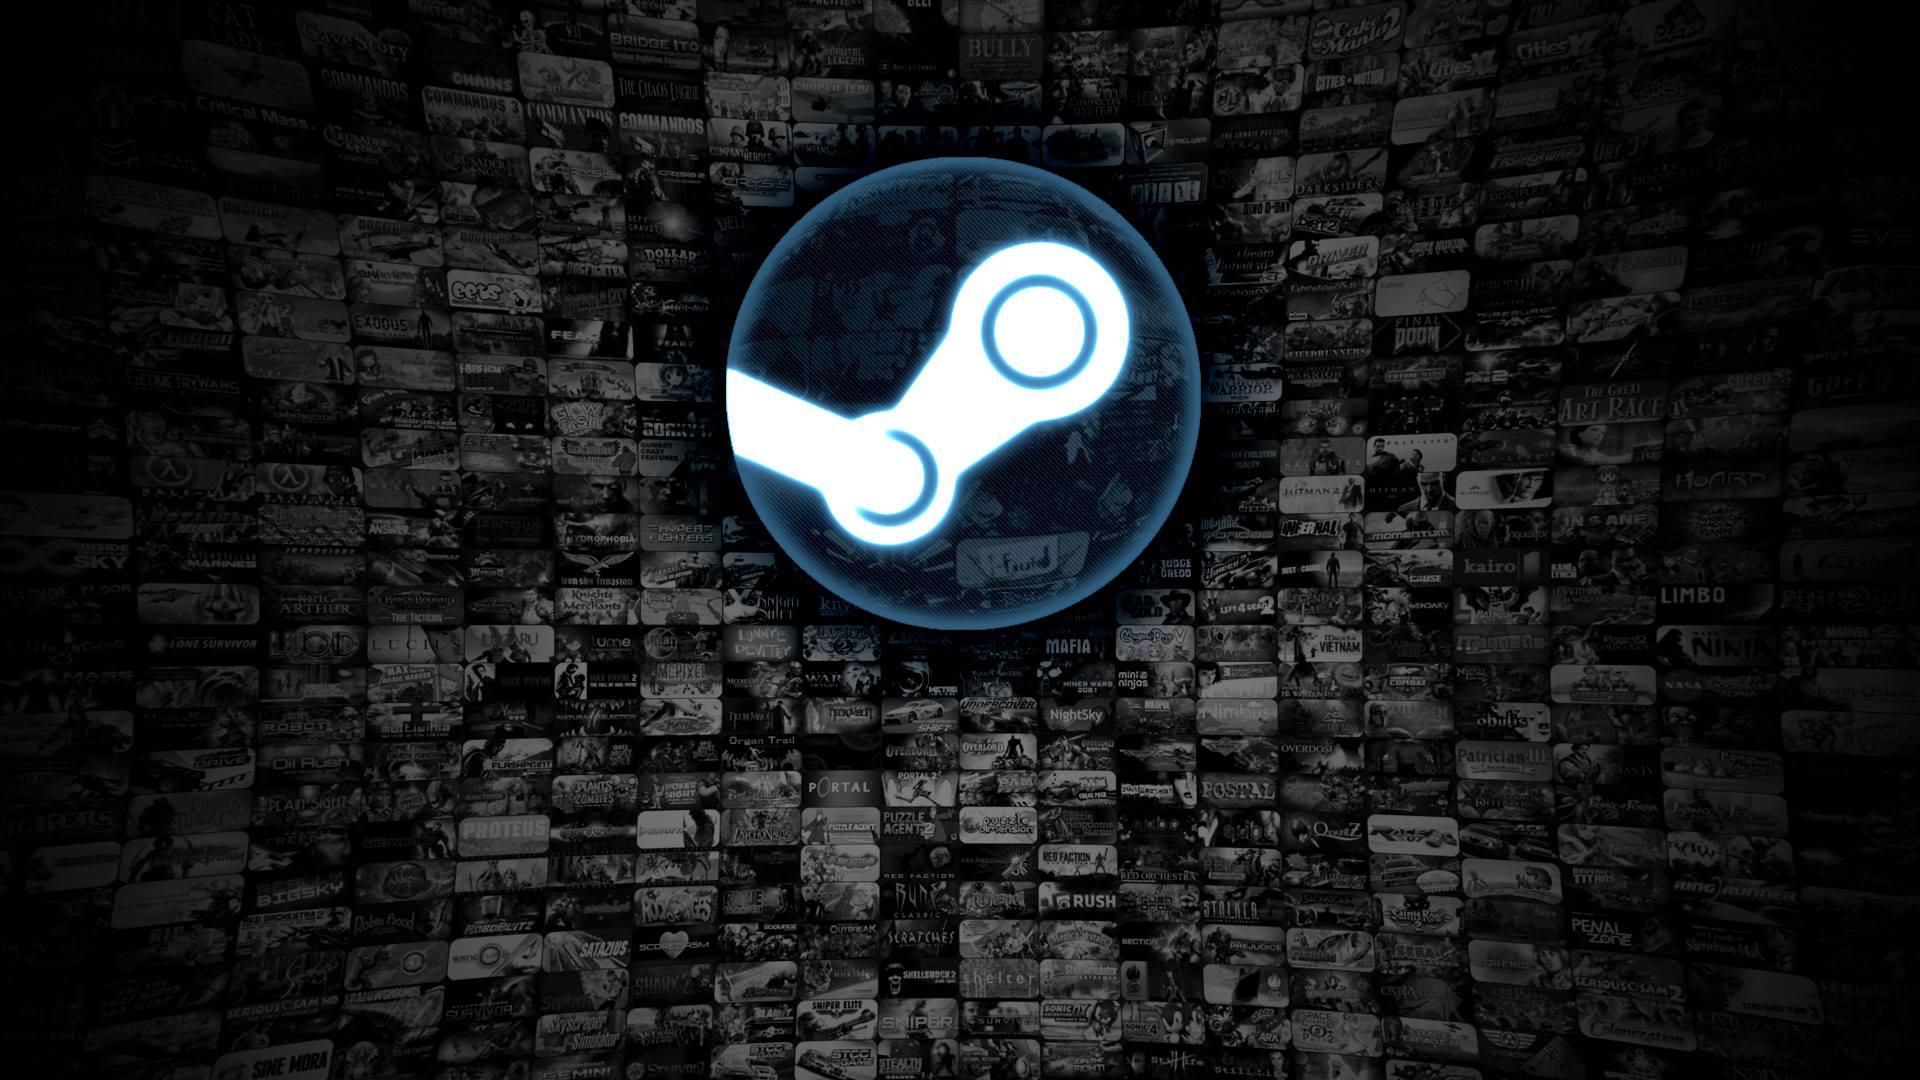 Раскрыты даты трёх больших распродаж в Steam